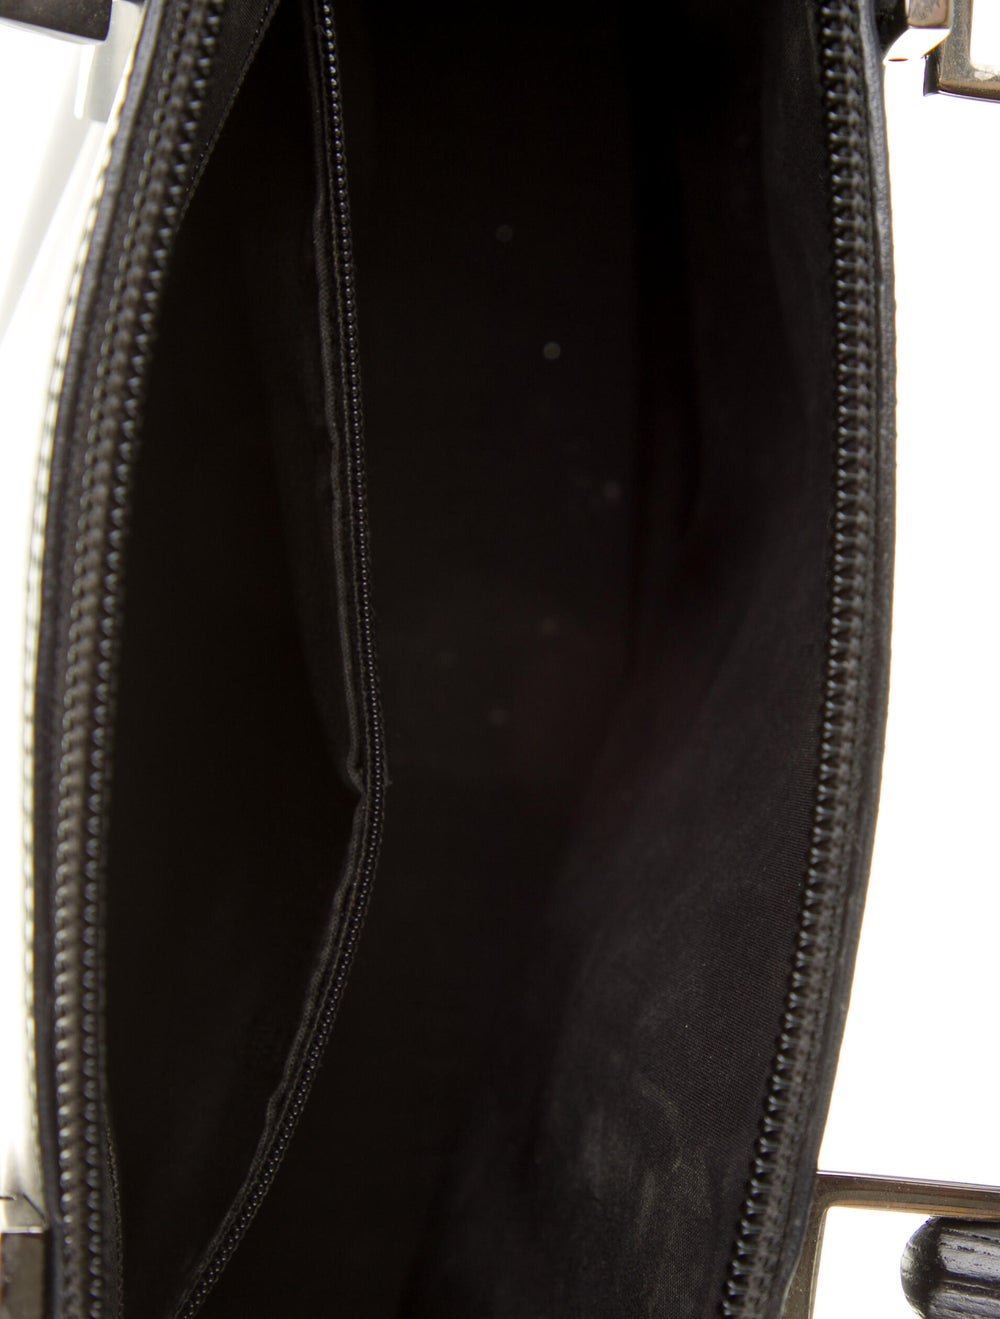 Gucci Bamboo Top Handle Bag Black - image 5